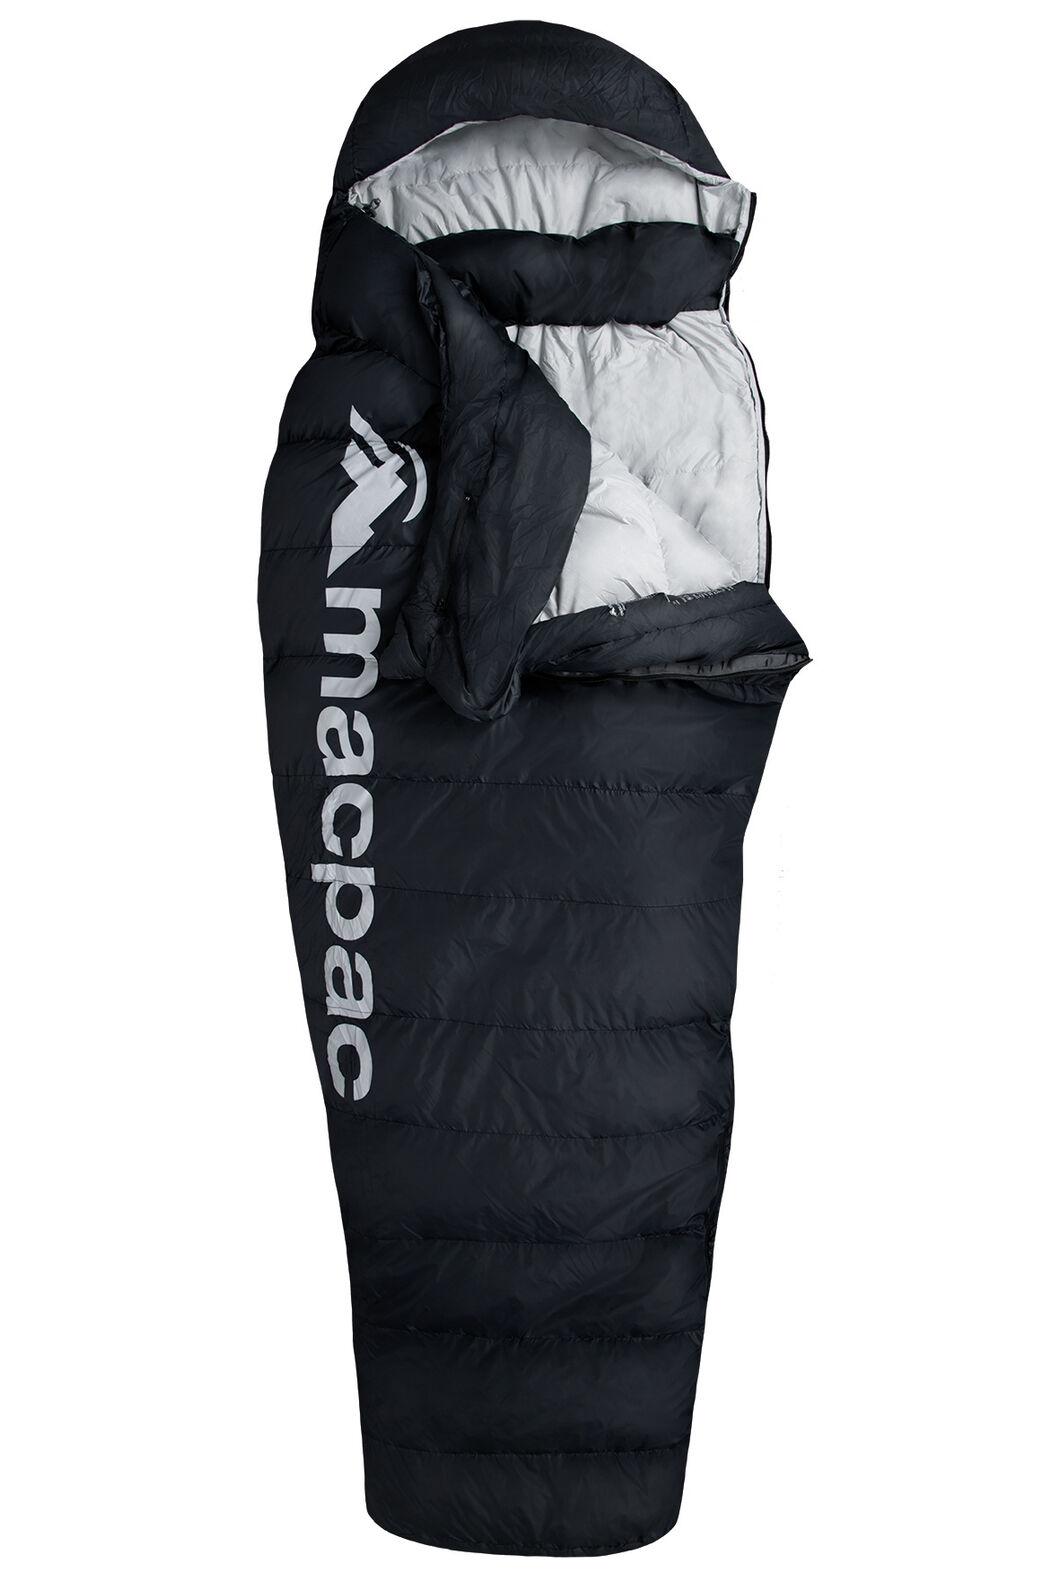 Macpac Overland Down 400 Sleeping Bag - Standard, Black, hi-res